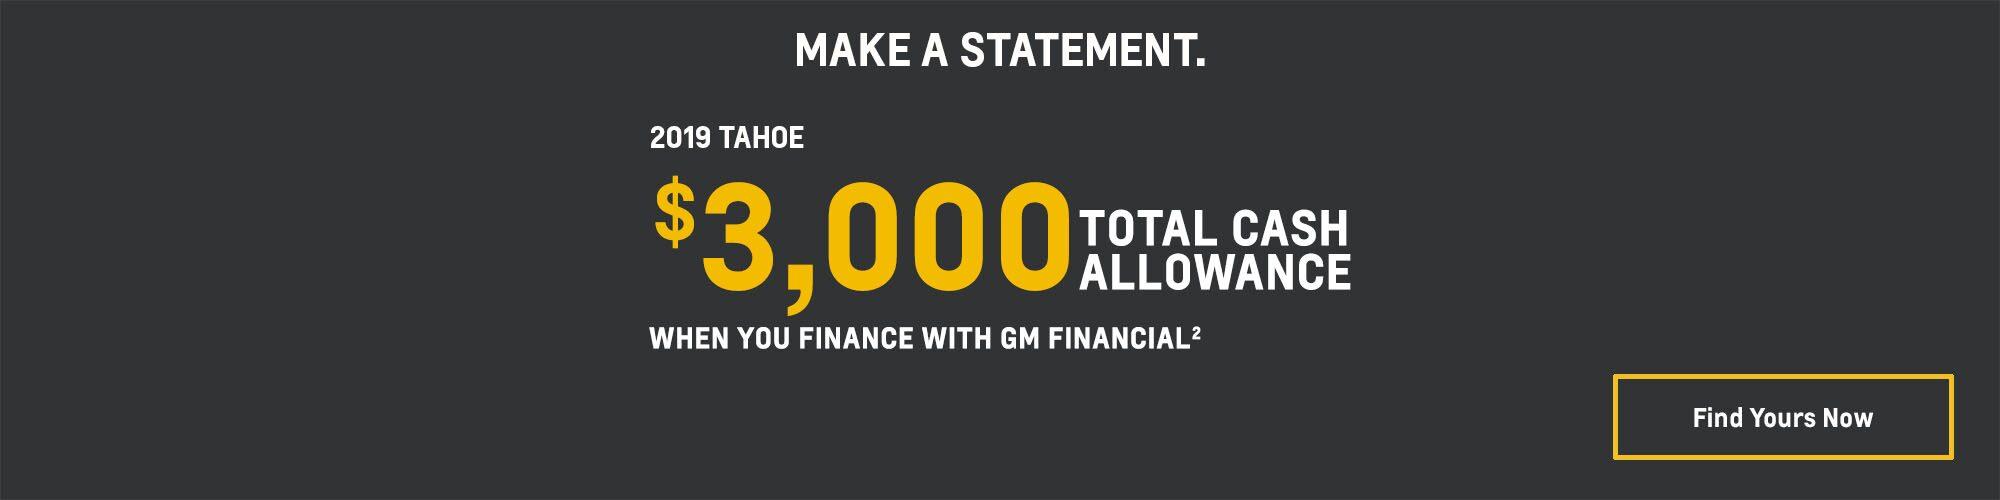 2019 Chevrolet Tahoe: $3,000 Total Cash Allowance